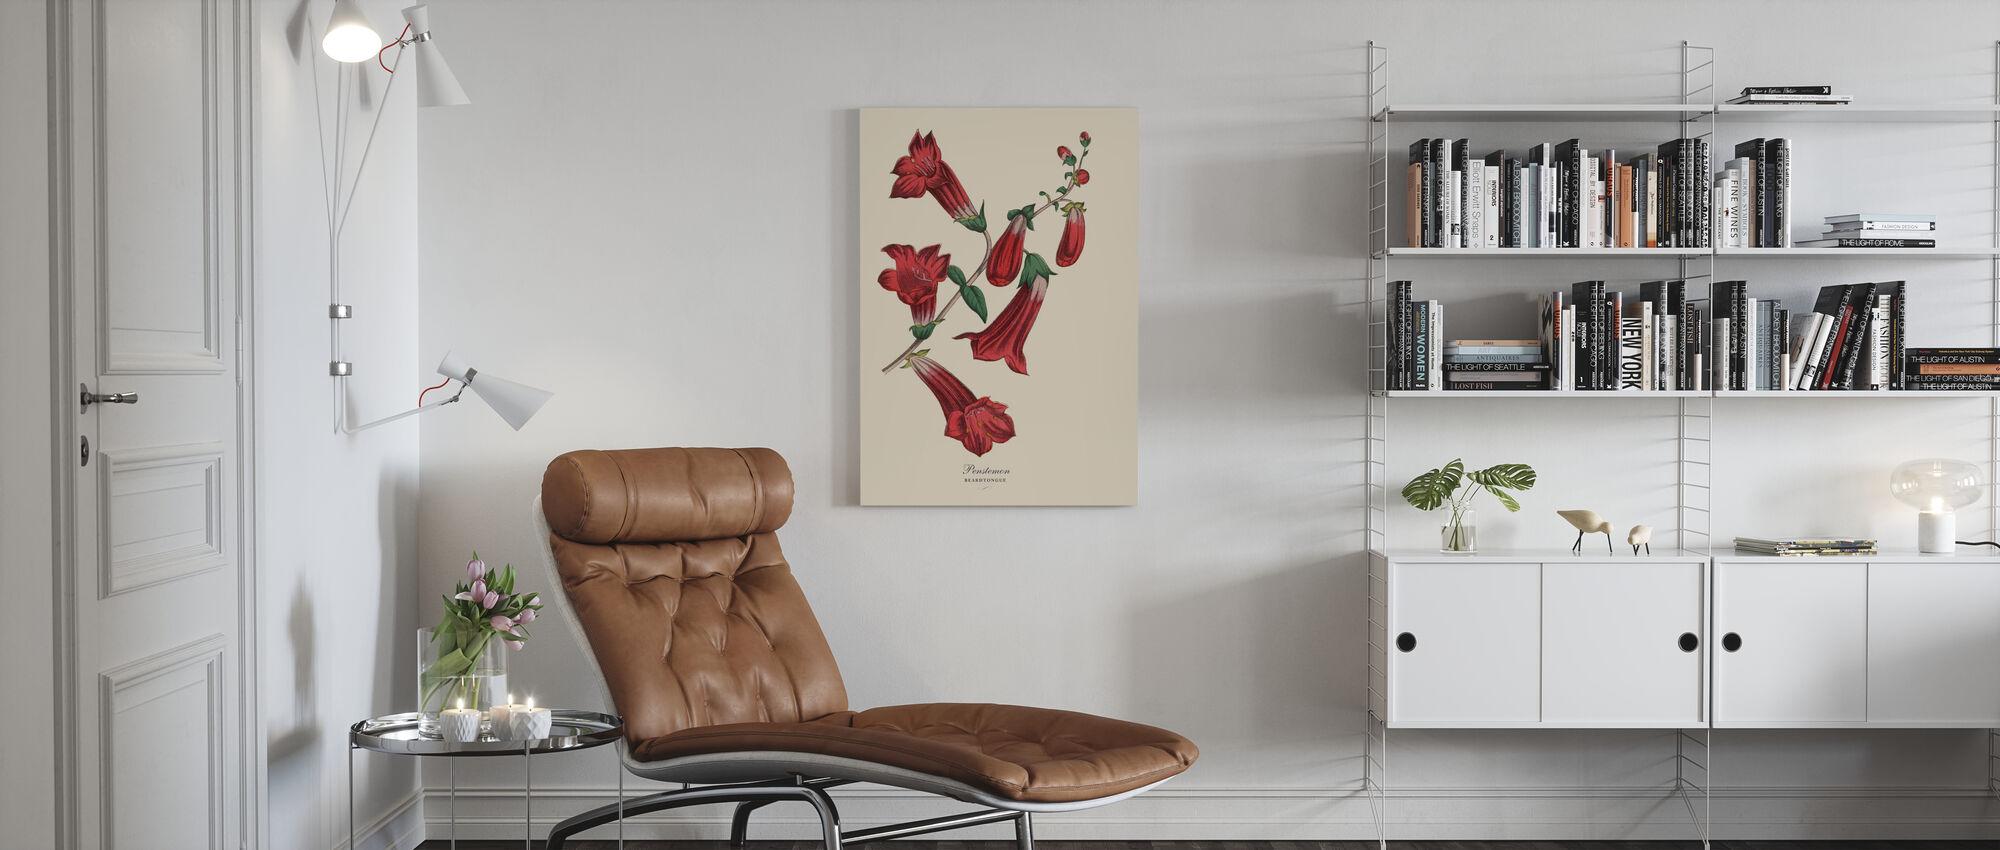 Beardtongue Plant - Canvas print - Living Room